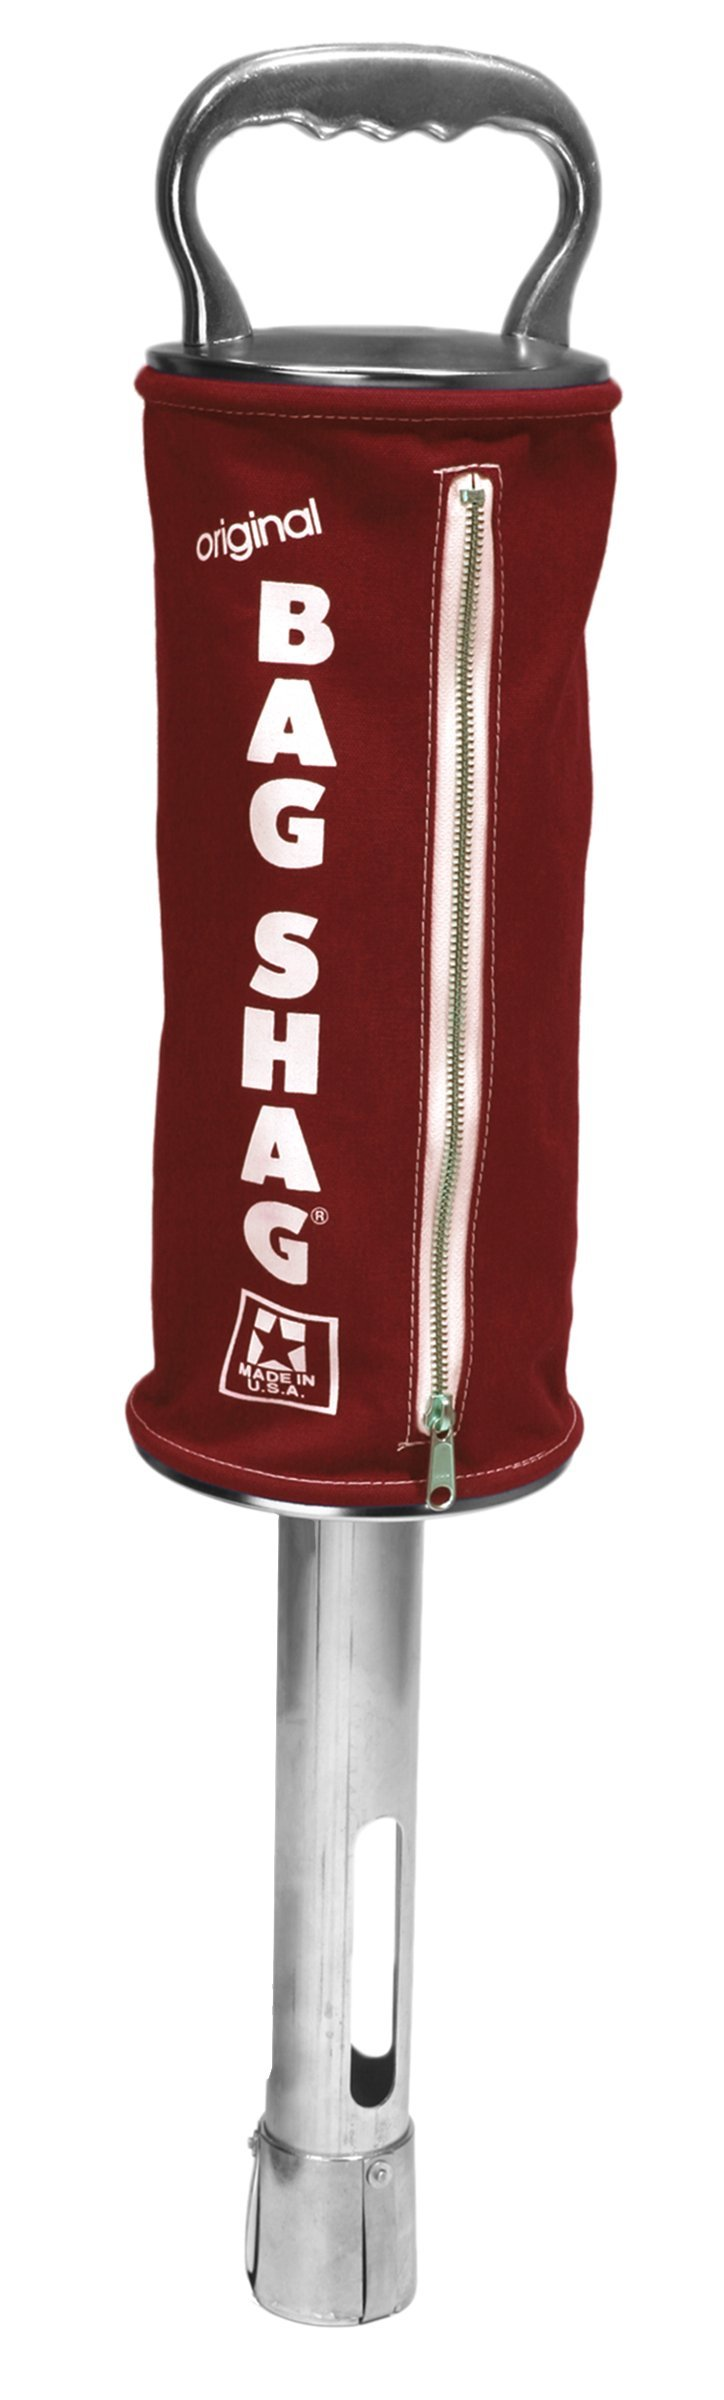 Original Shag Practice Range Shagger